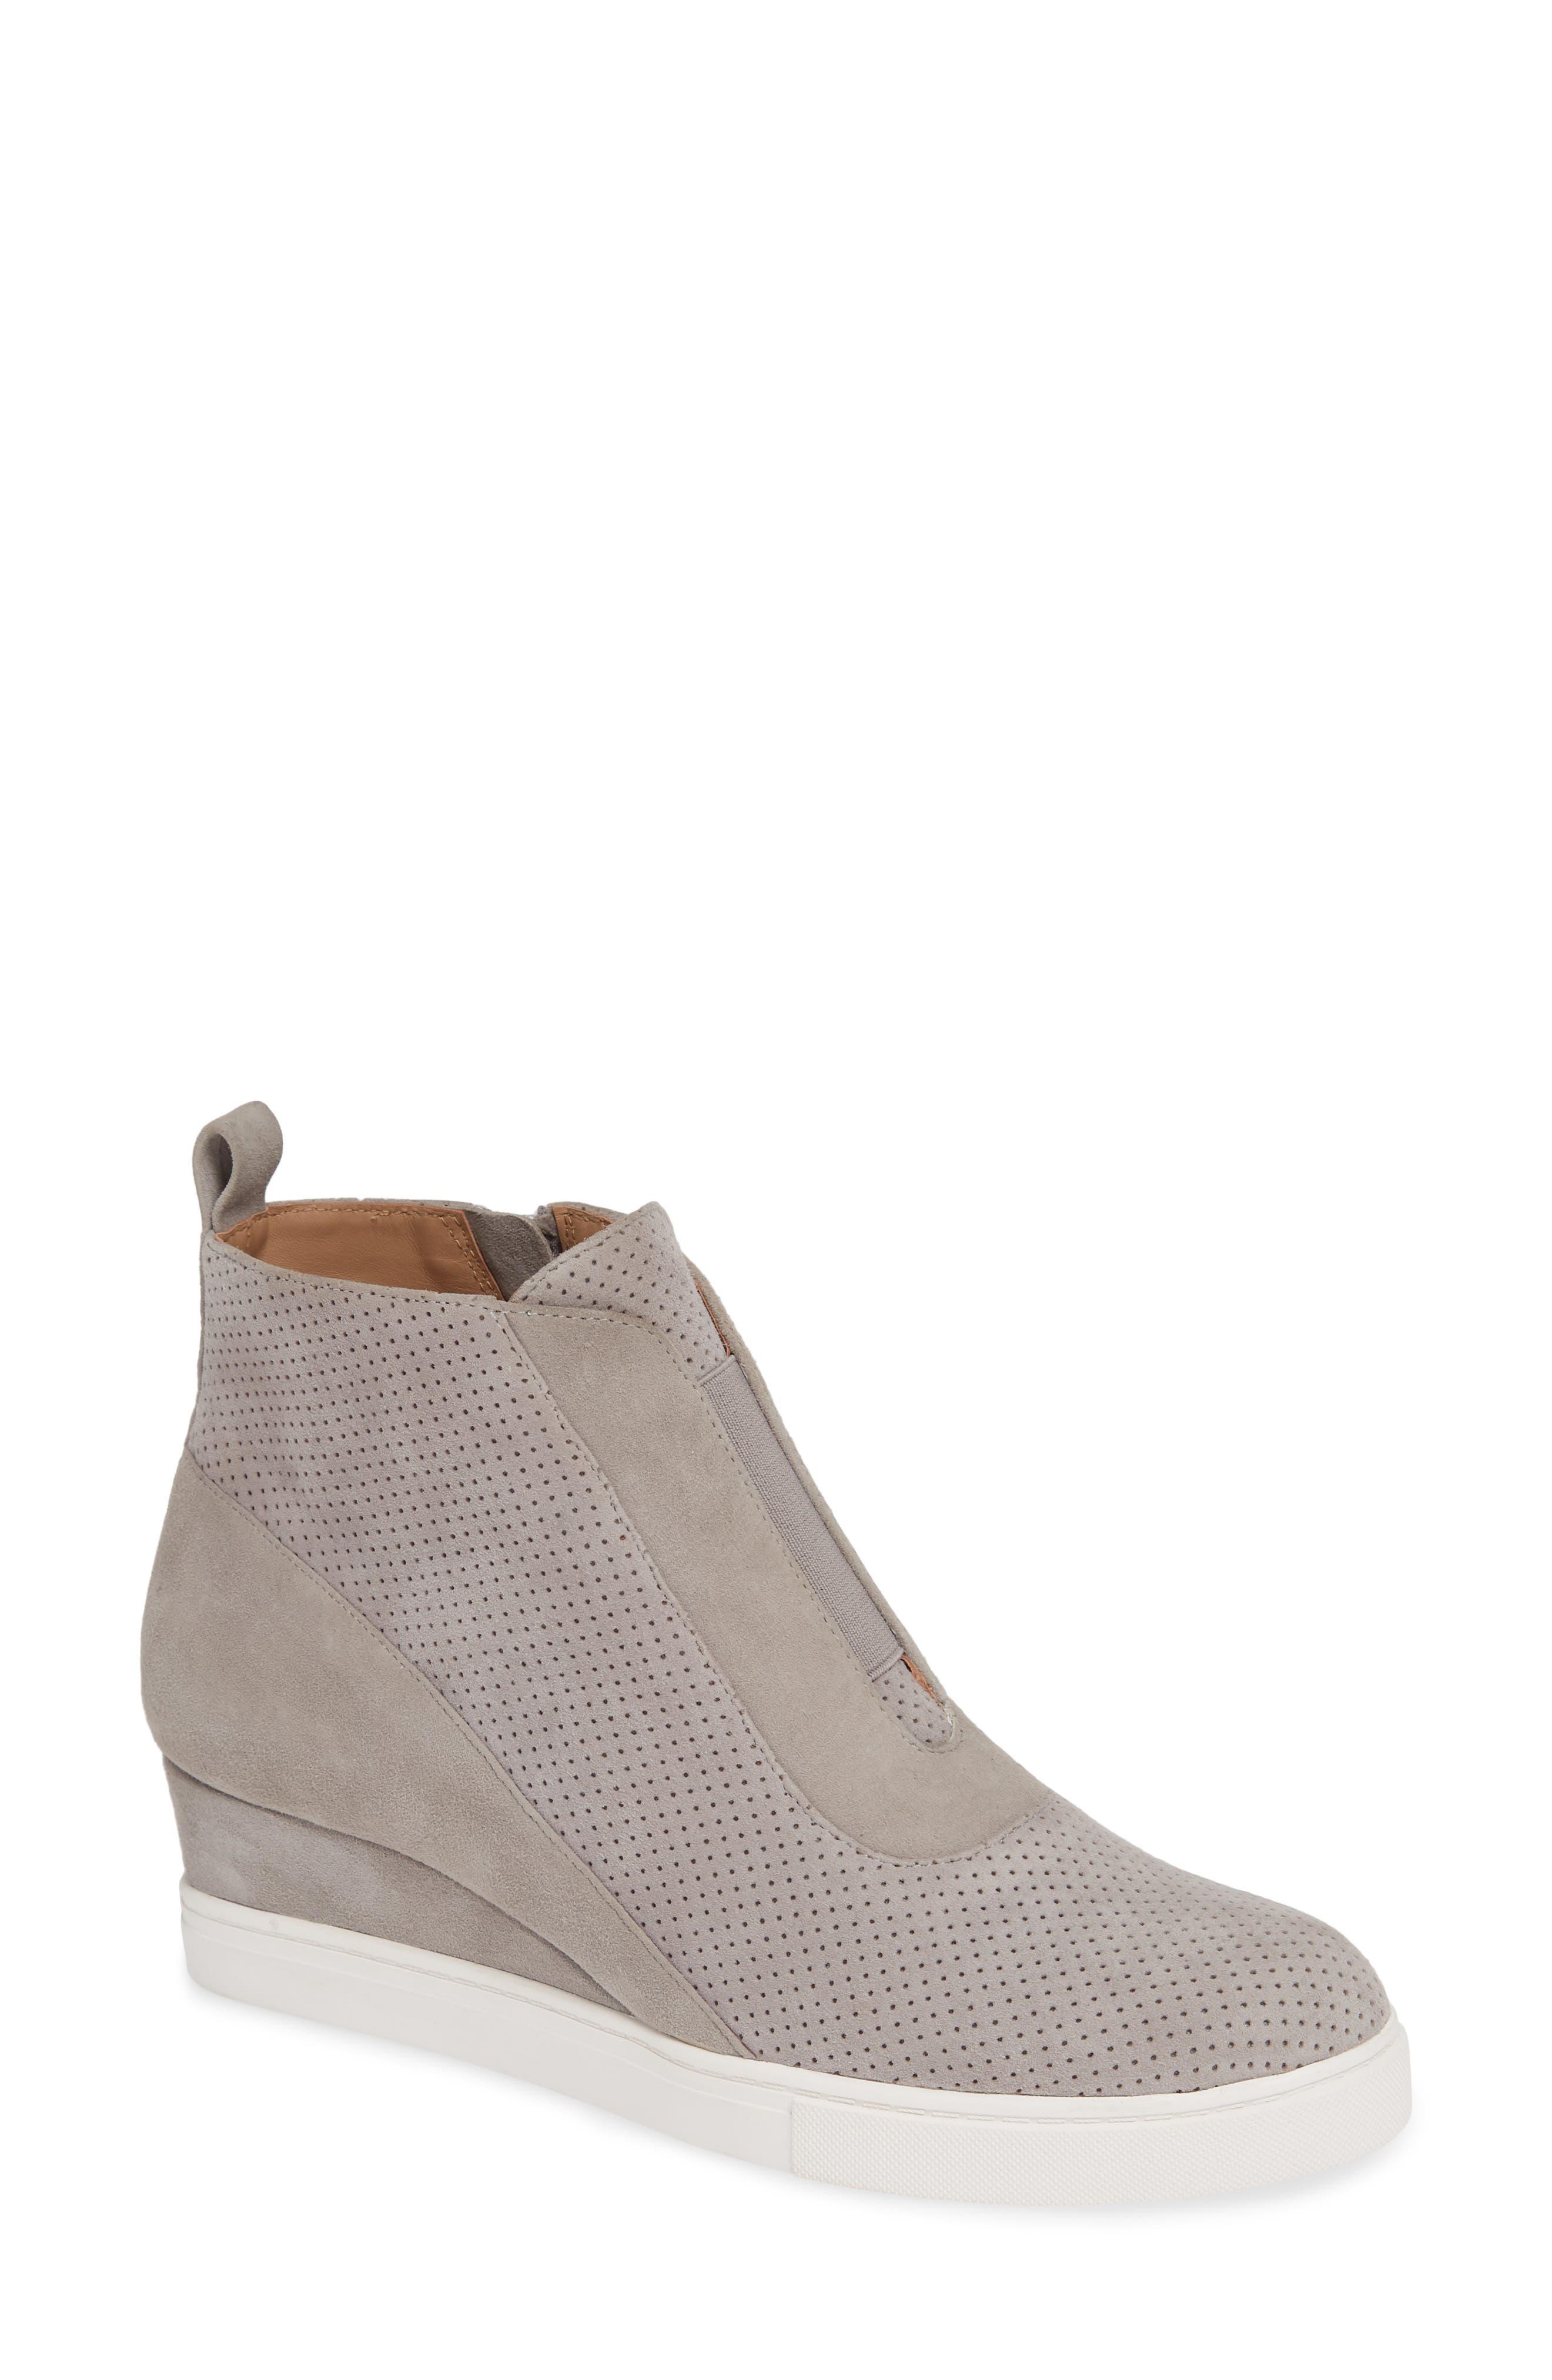 Anna Wedge Sneaker, Main, color, ROCK PER SUEDE